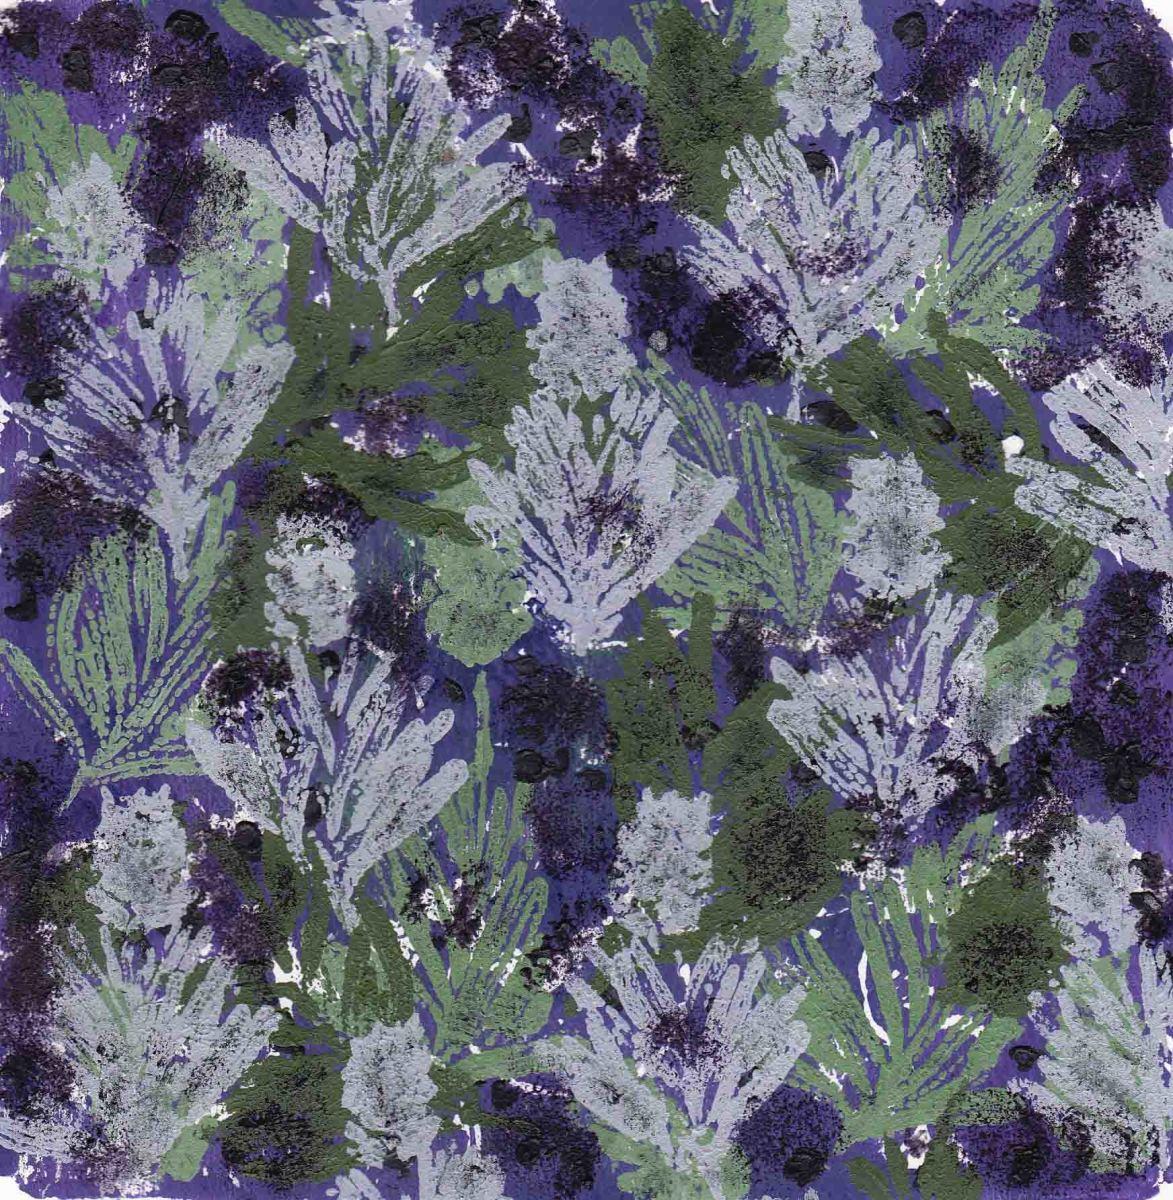 Floral Field 2 by Jacky Lowry